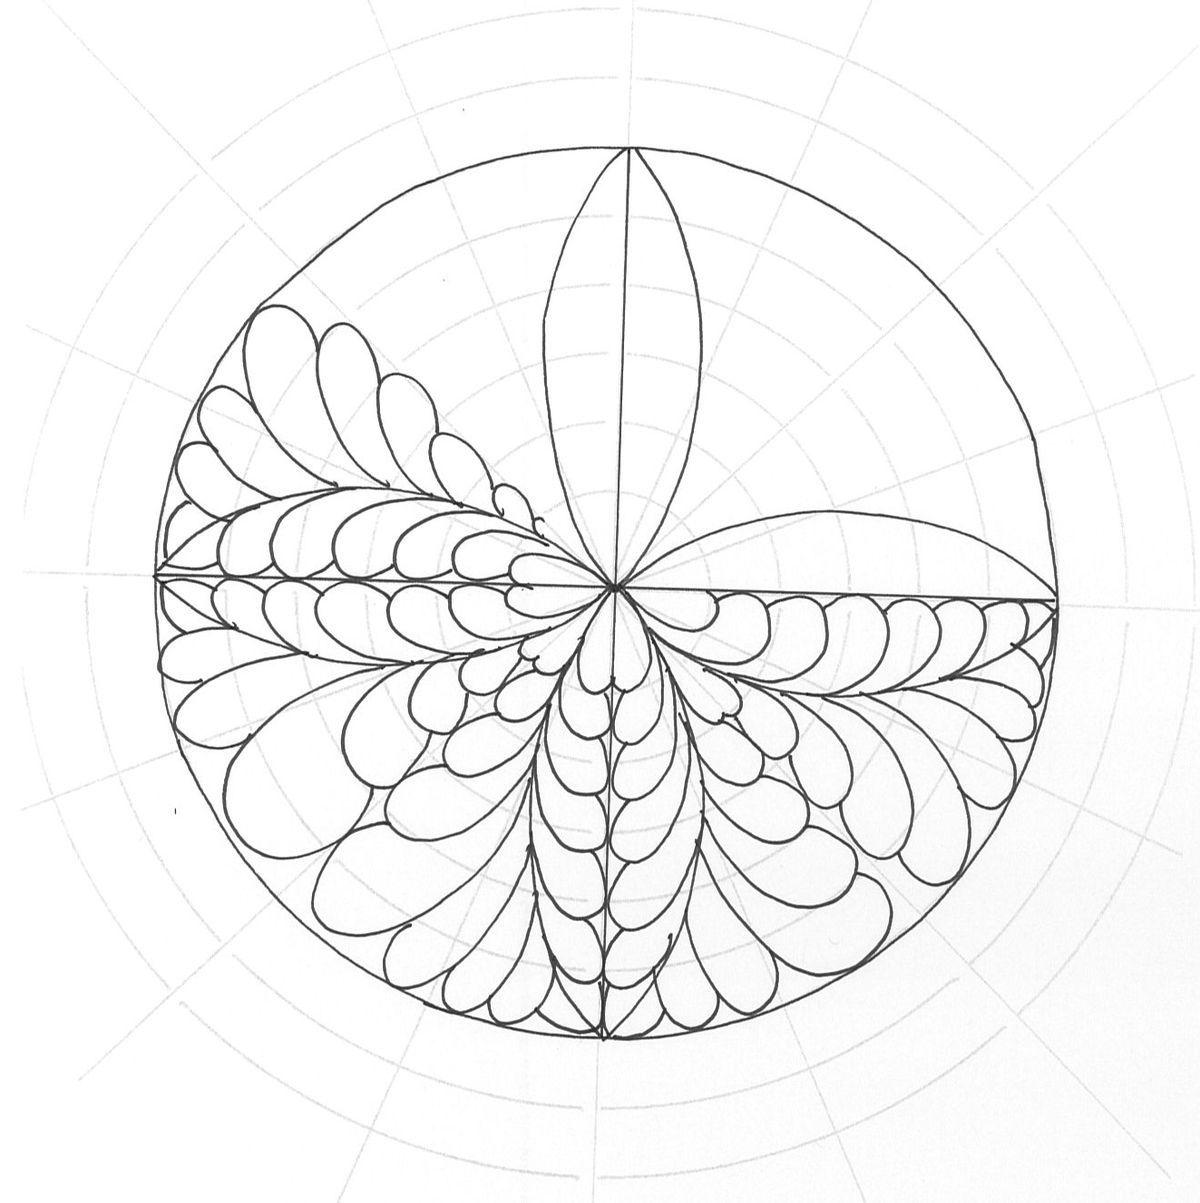 Pin de Lisa Bierman en Top Quilt Patterns / Tutorials | Pinterest ...